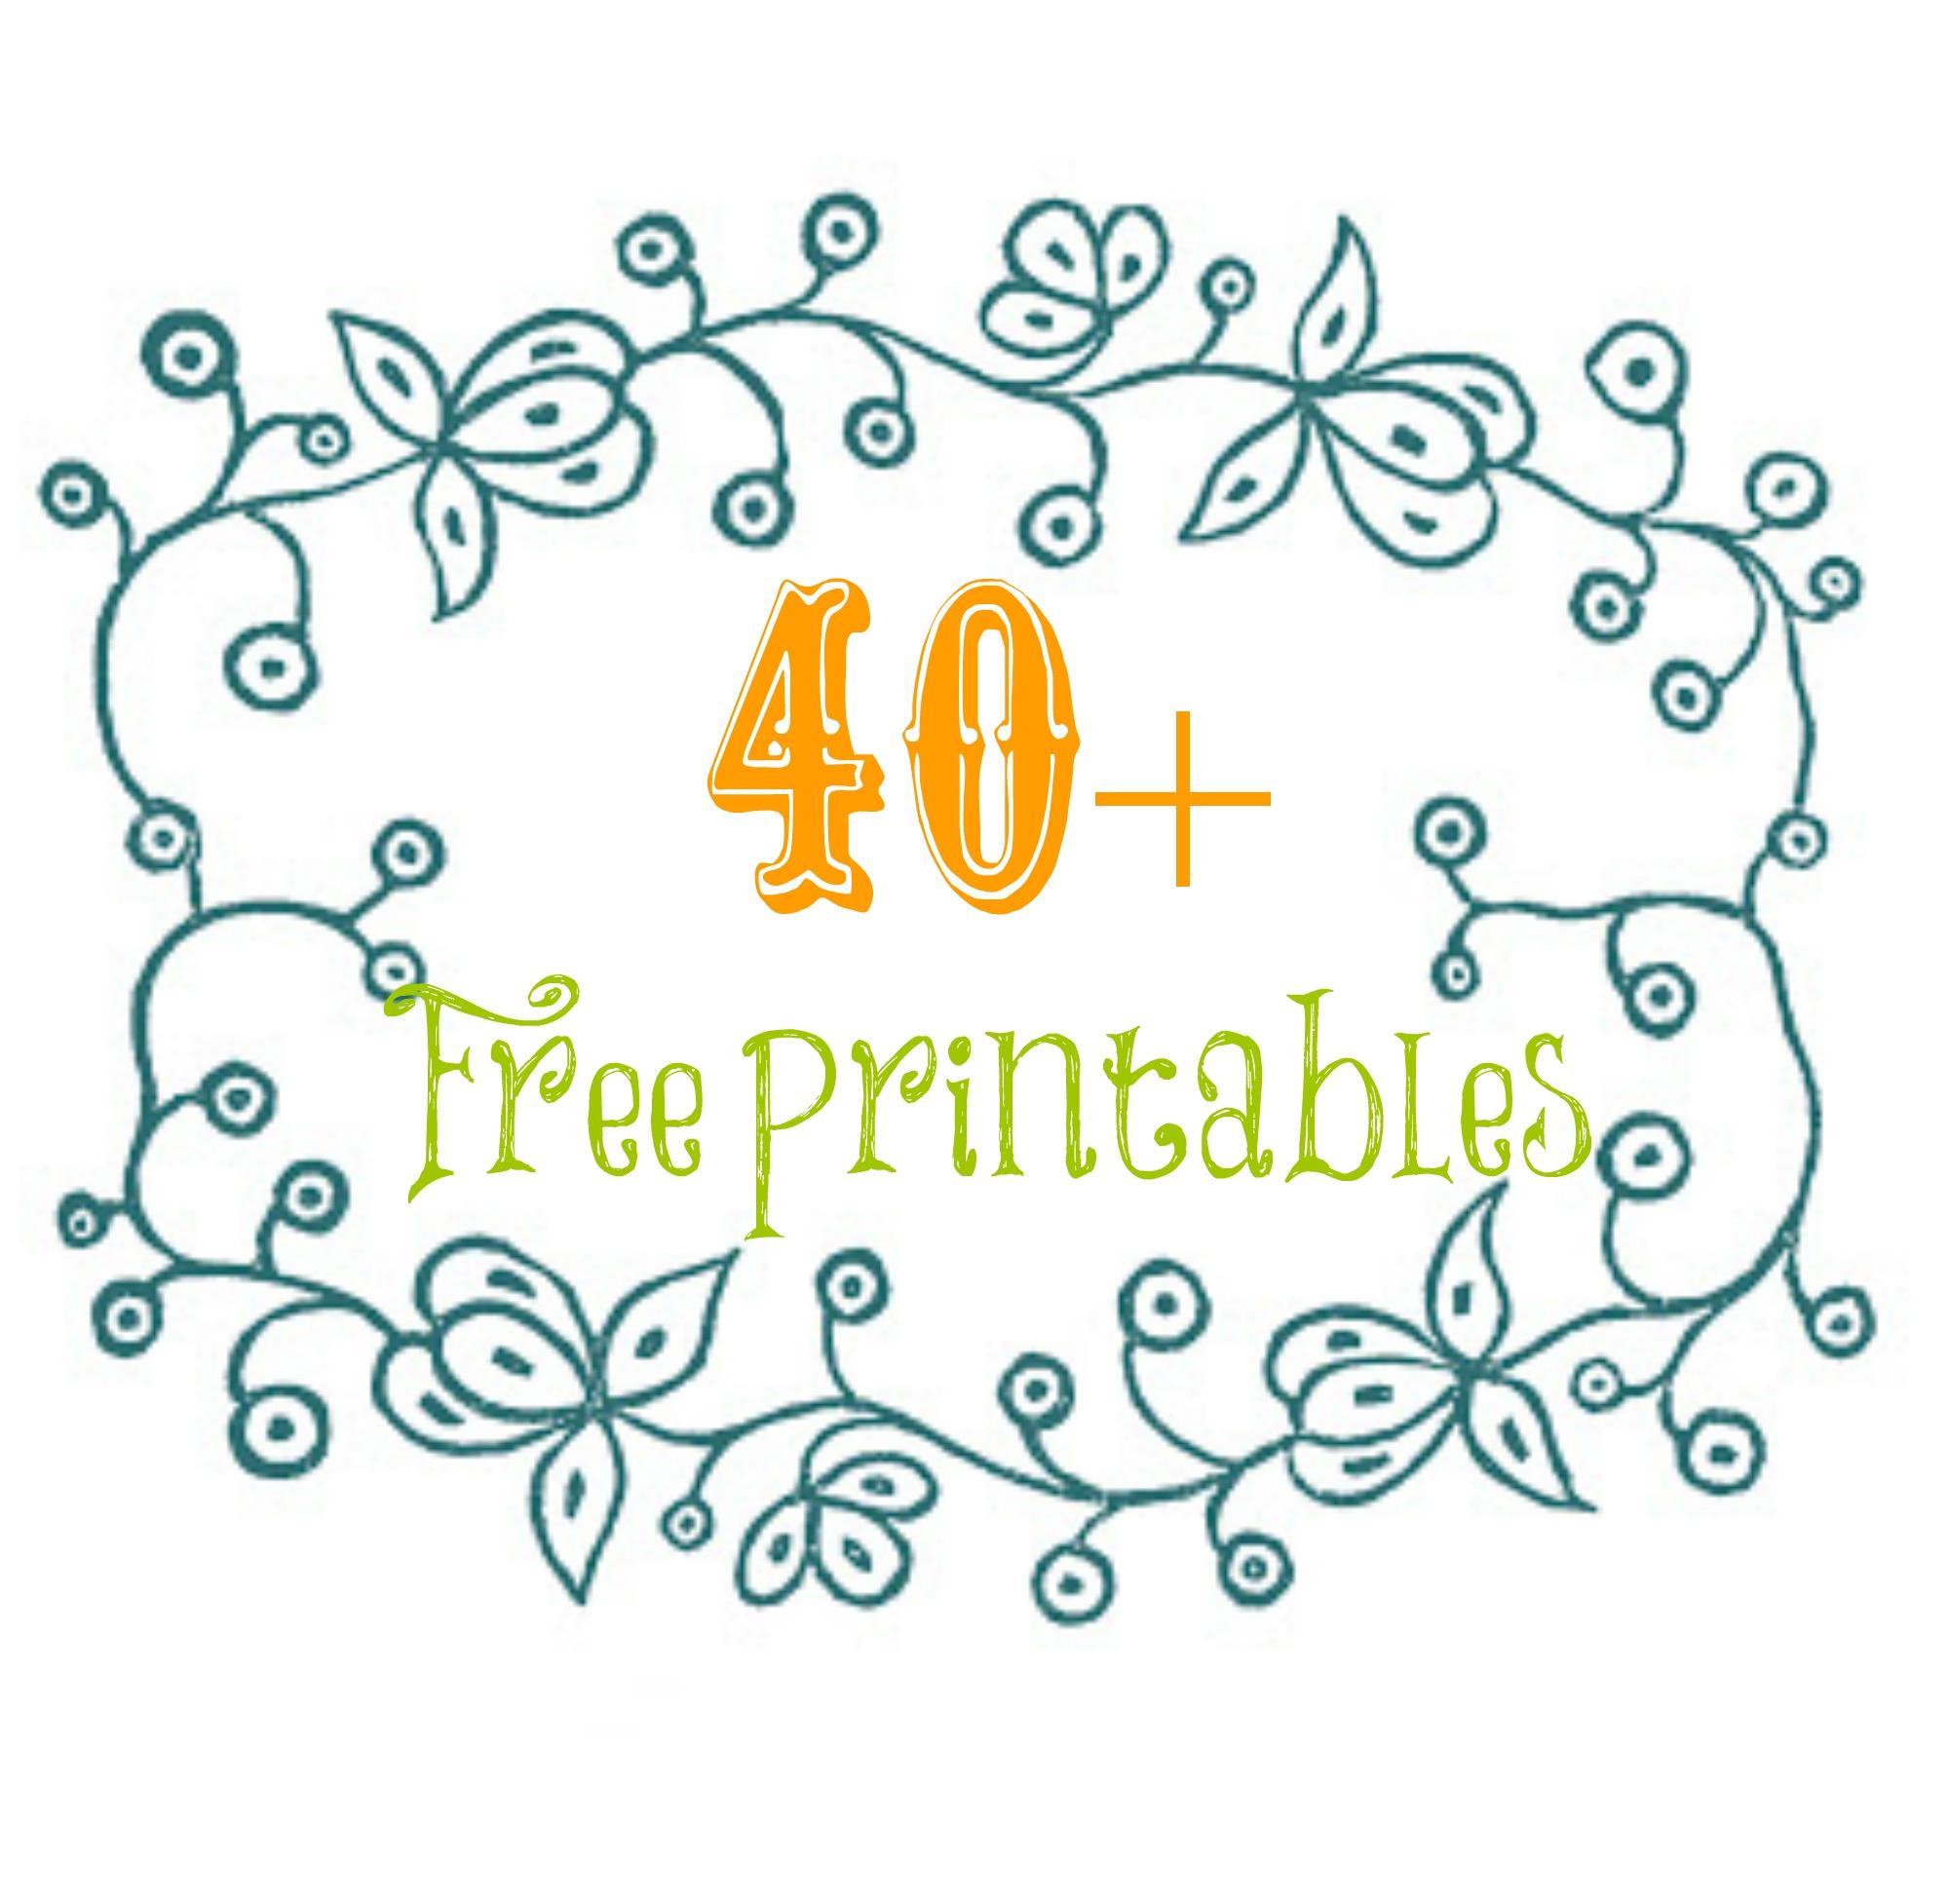 40 + Free Printables